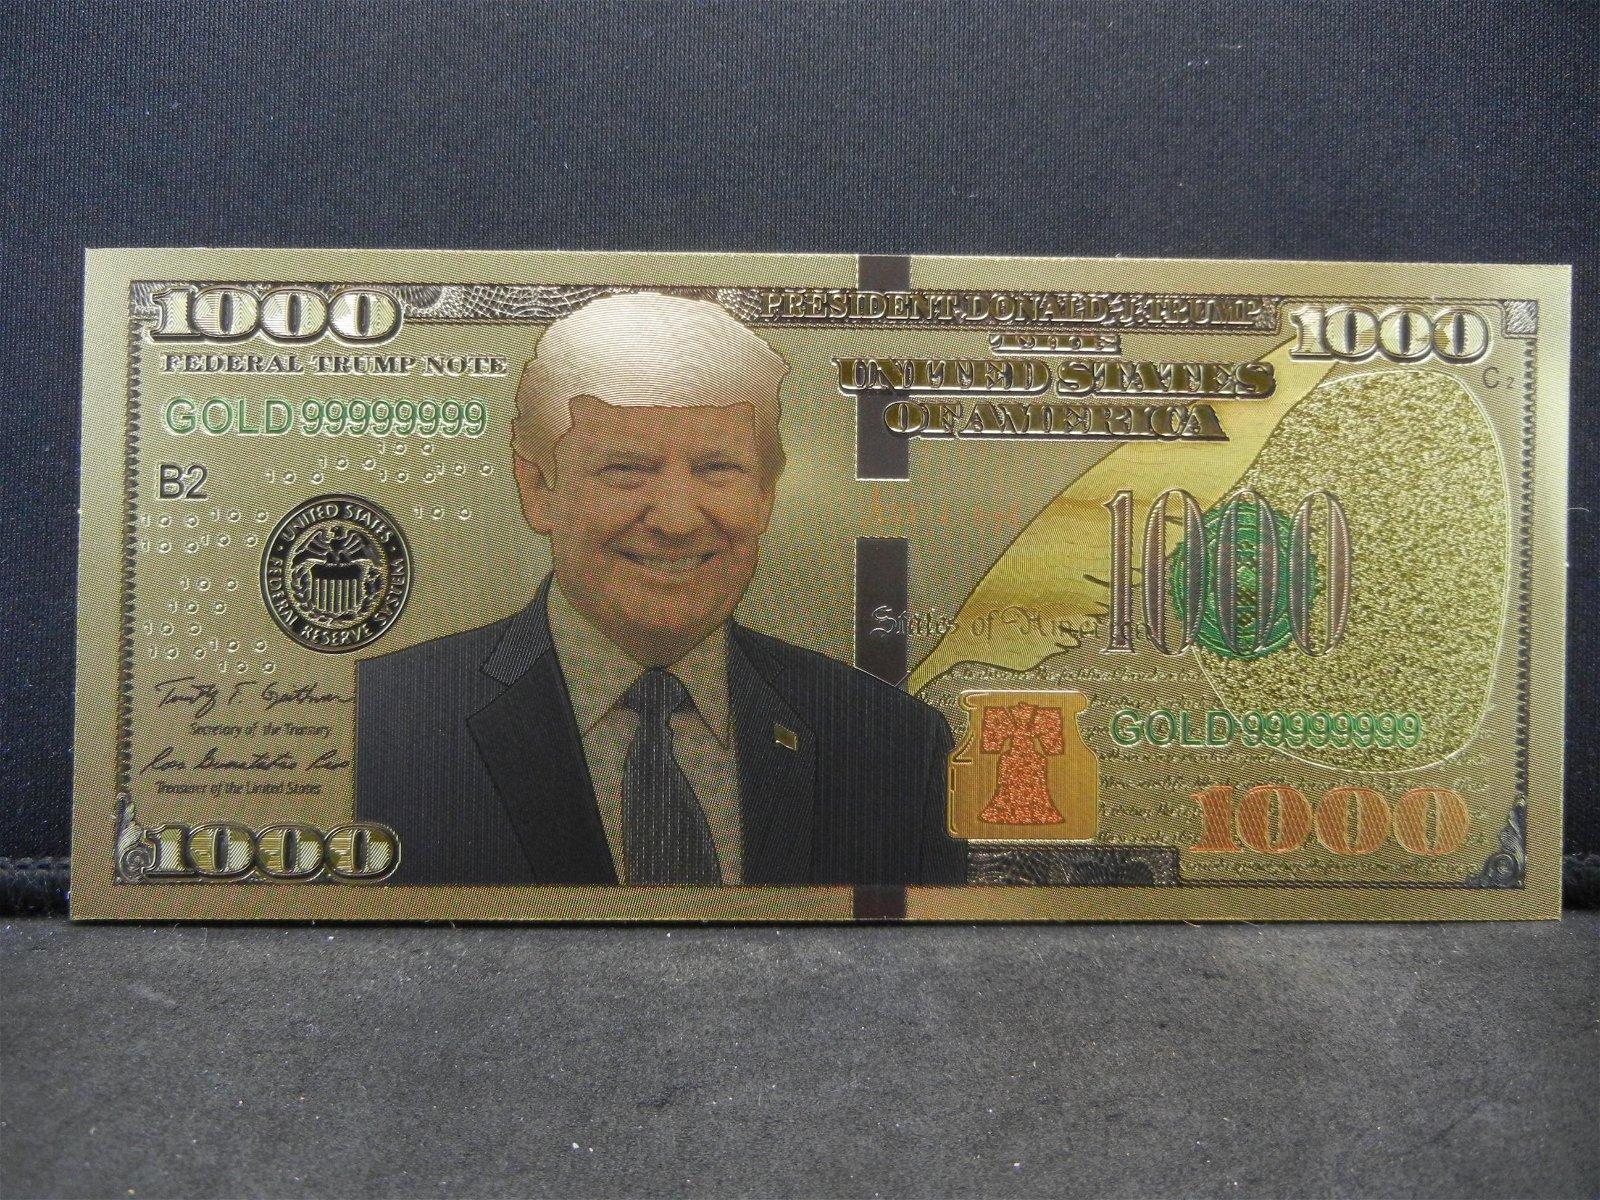 NOVELTY $1,000 Donald Trump Gold Foil Note Not Legal